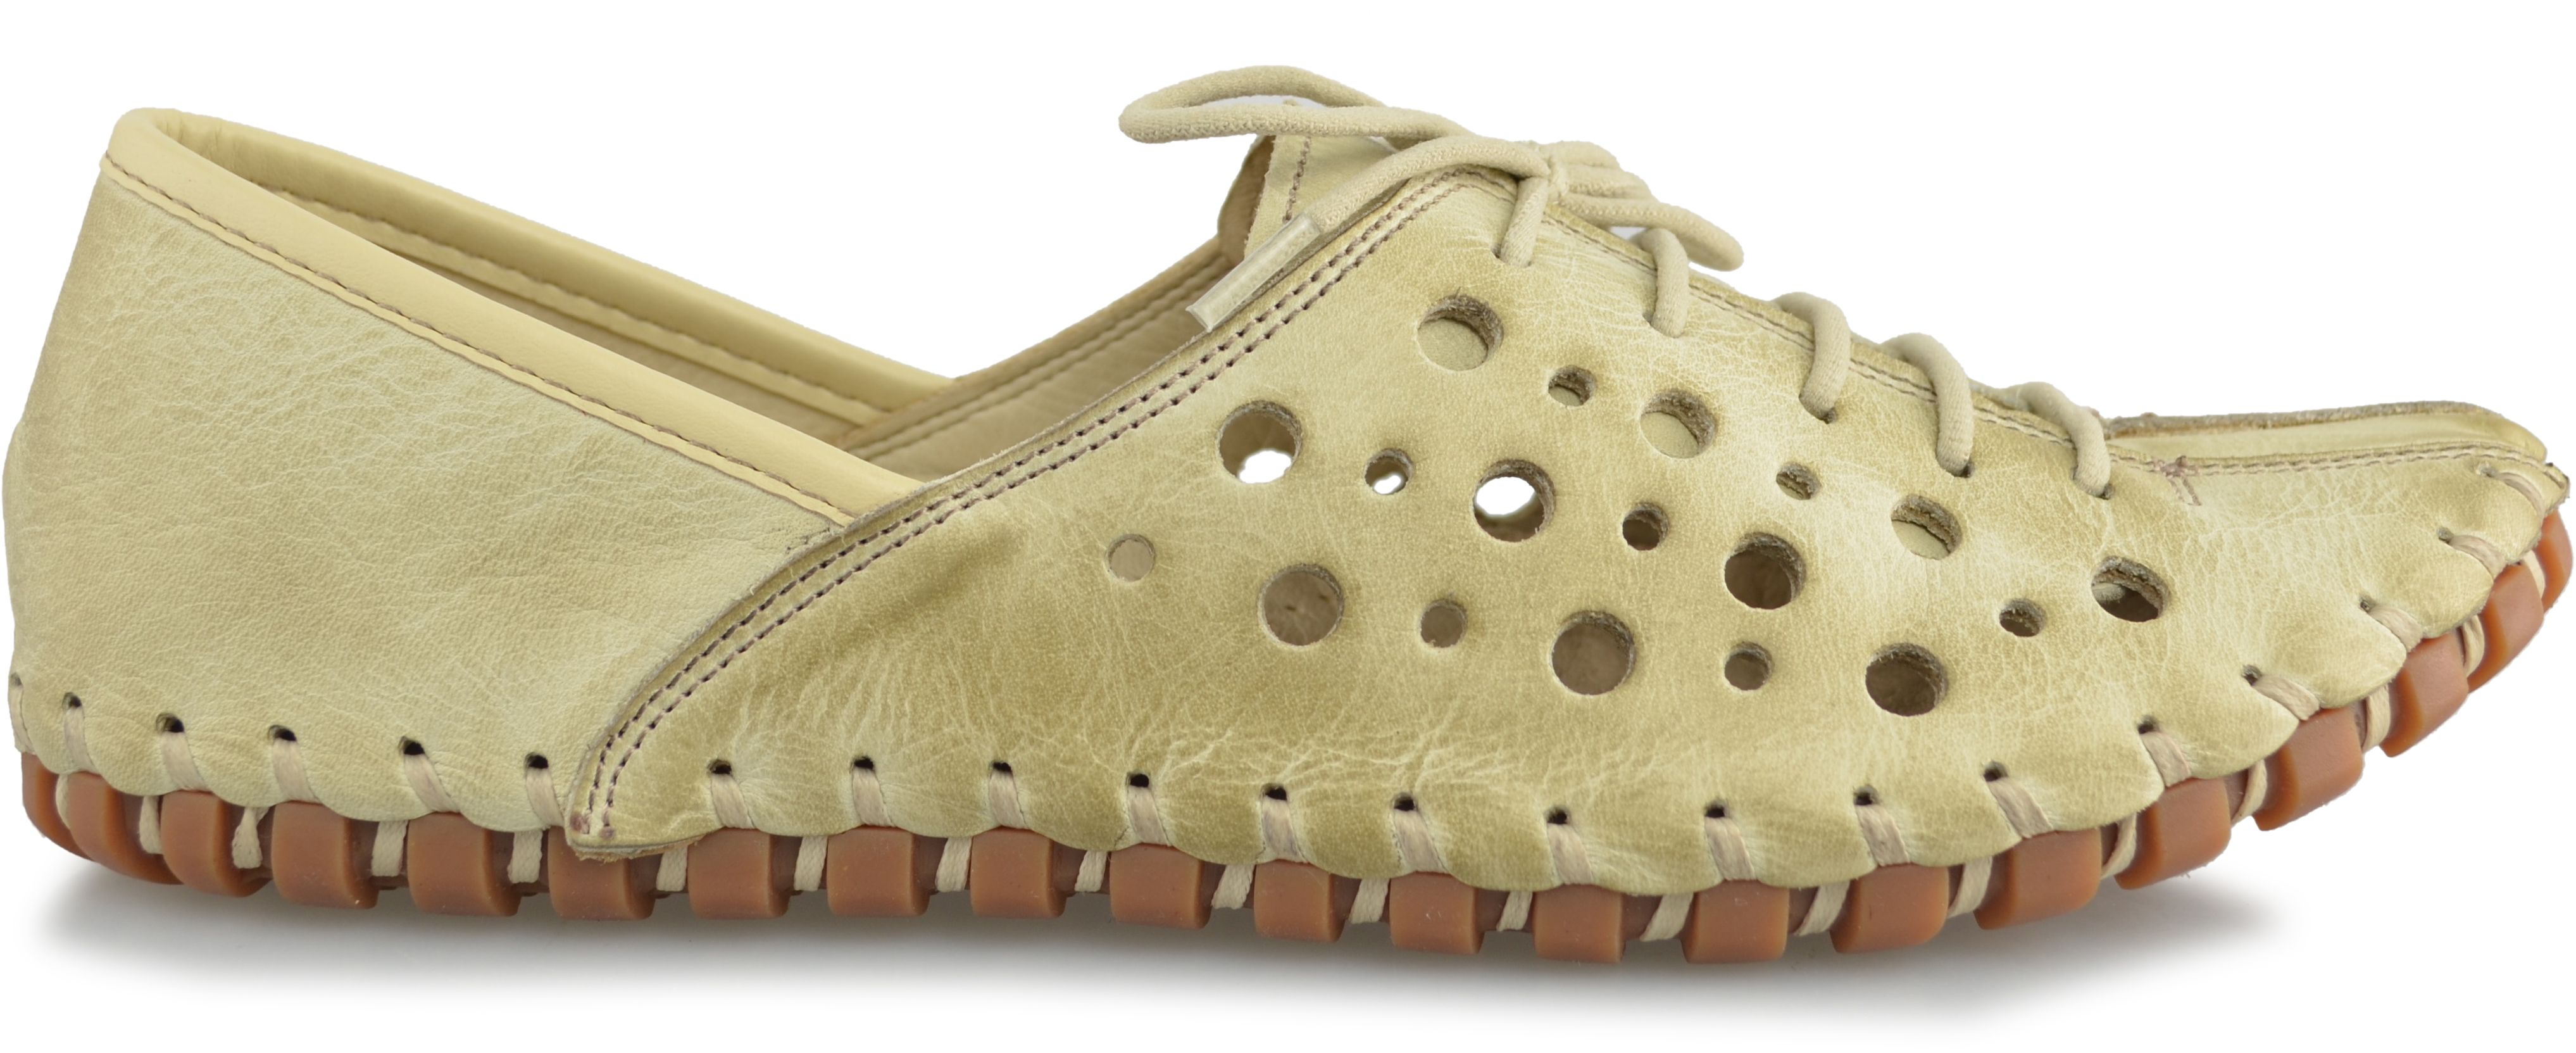 CULP-NUDE - Buy Womens shoe brands online Stegmann, KO